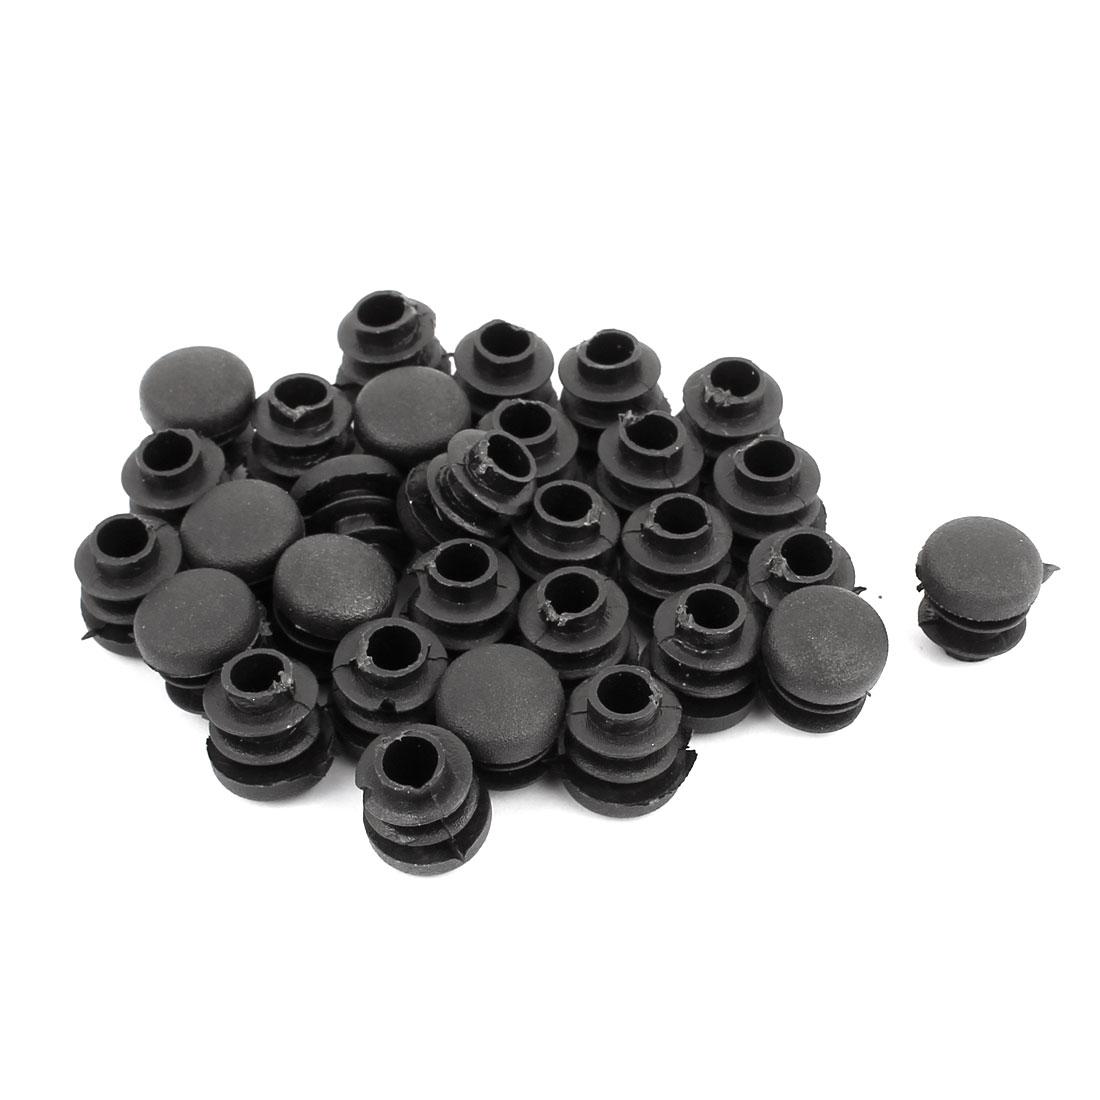 Plastic Round Ribbed Tube Inserts End Blanking Caps Black 14mm Diameter 30pcs